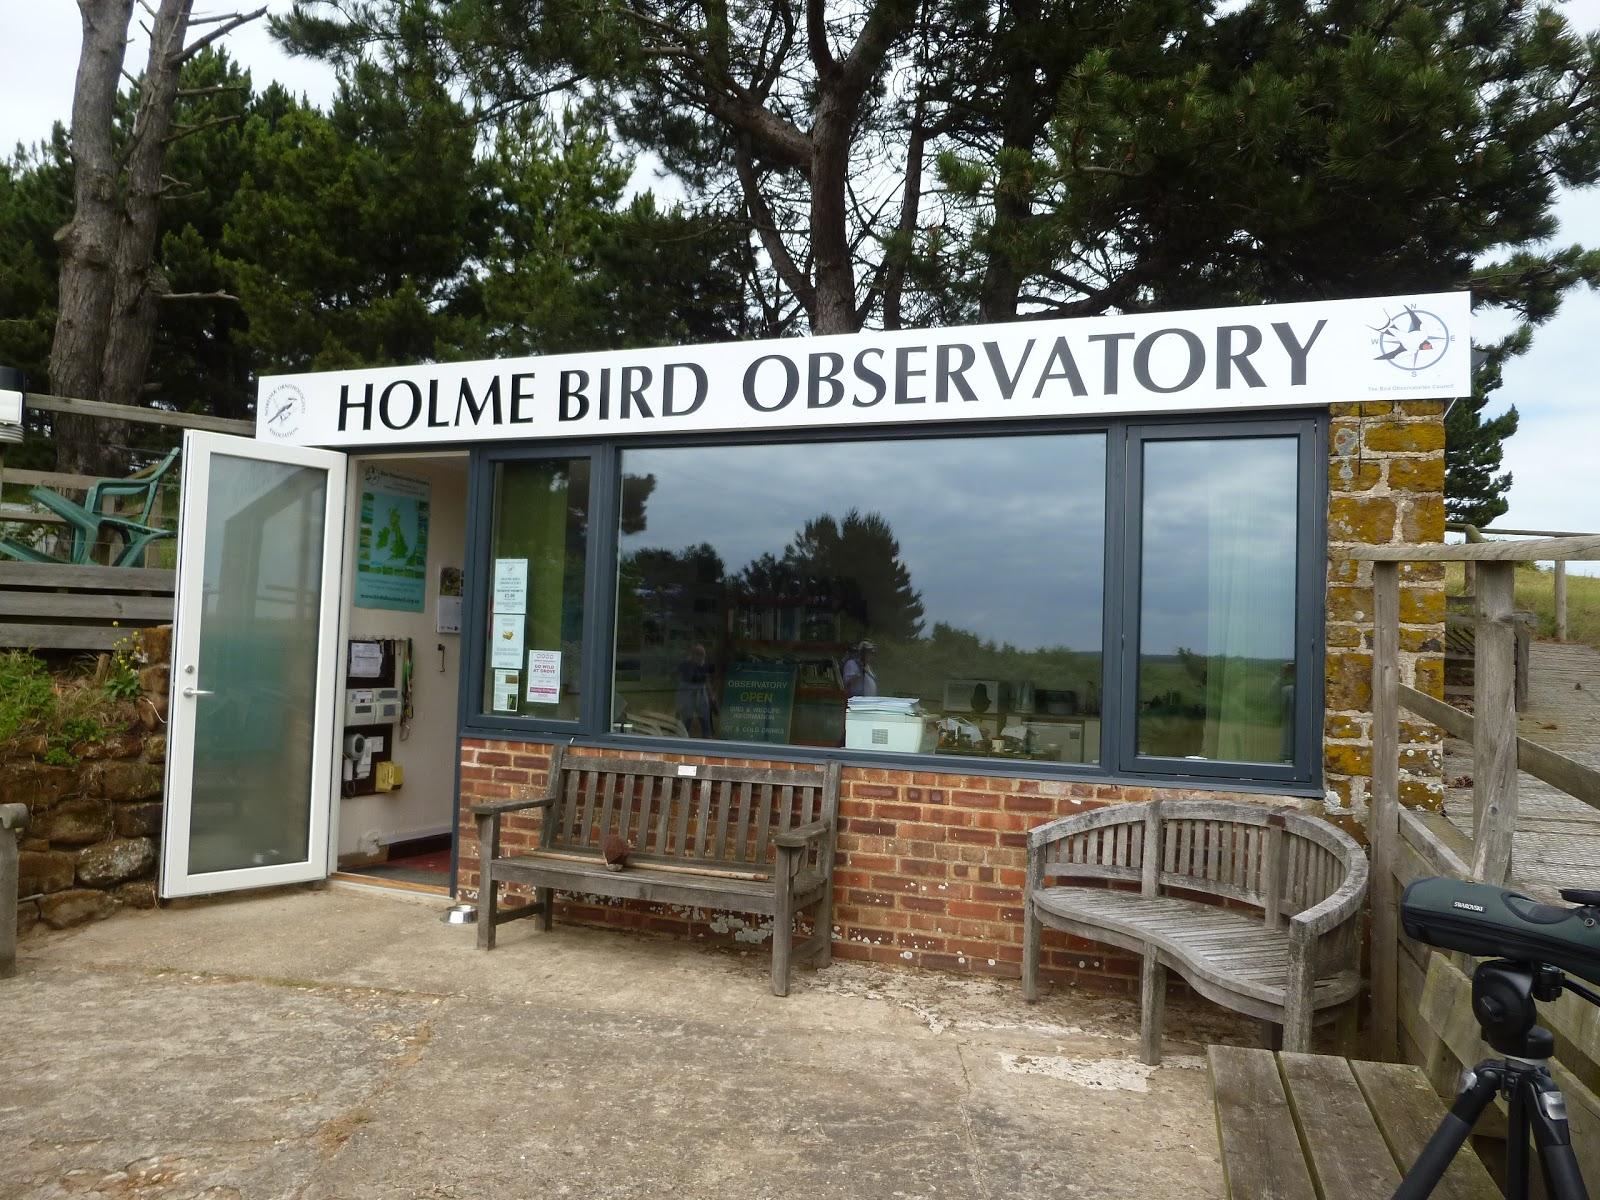 Holme Bird Observatory